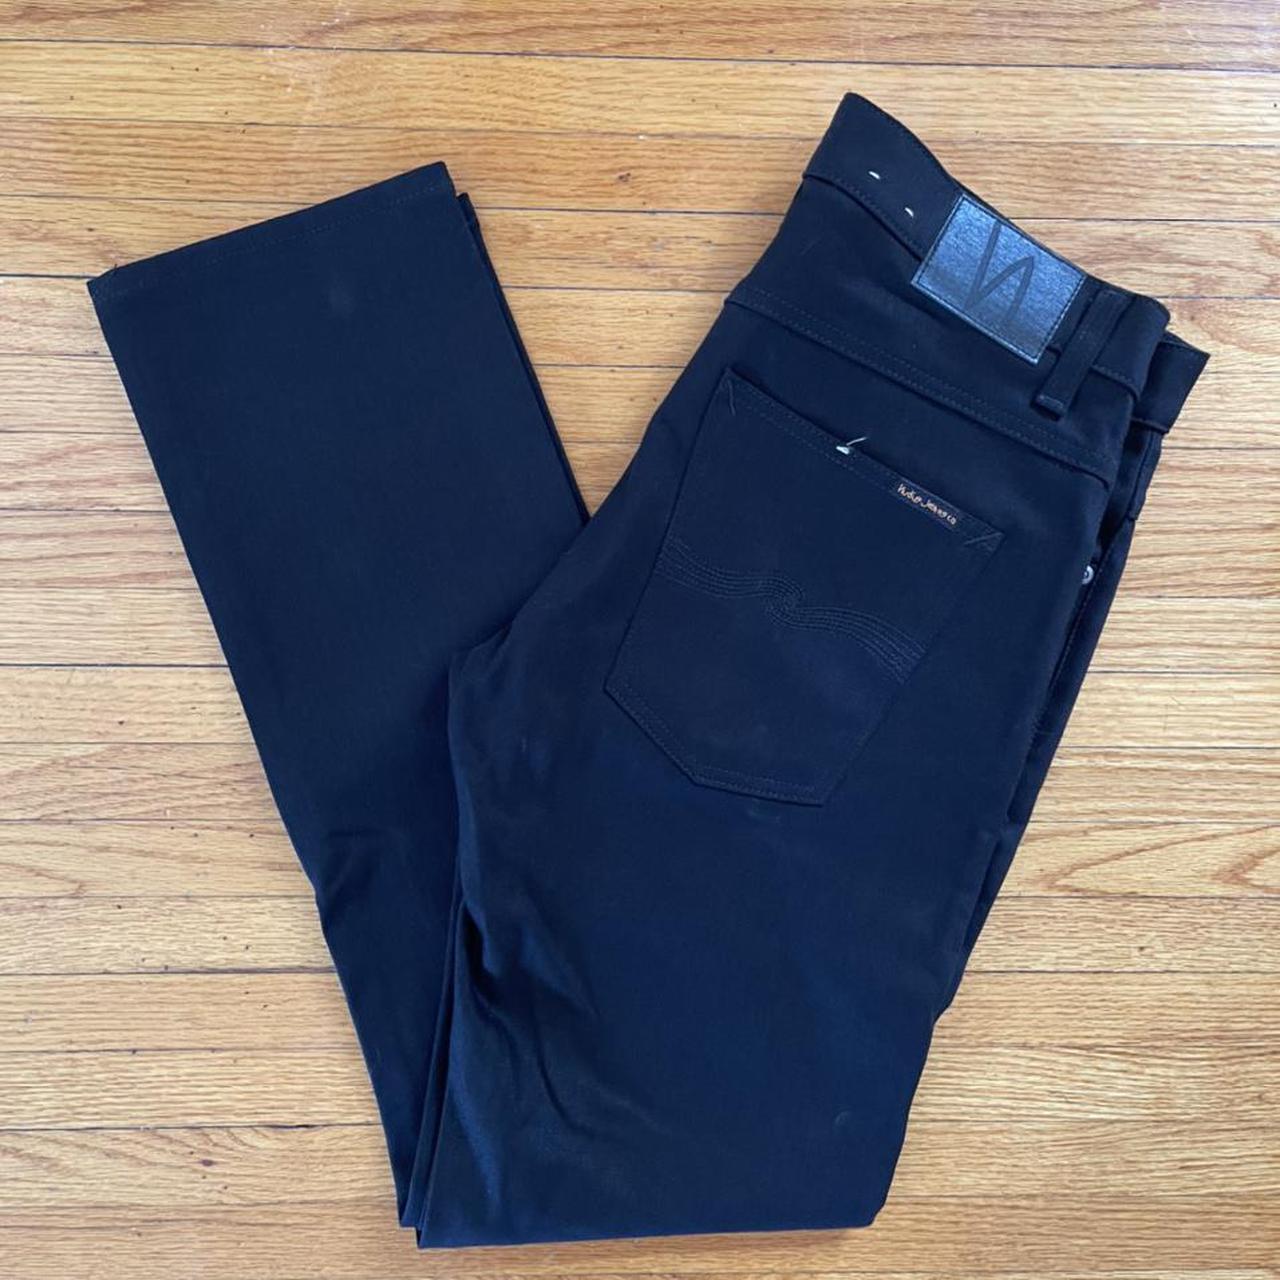 Product Image 1 - Nudie Jeans Co. Grim Tim